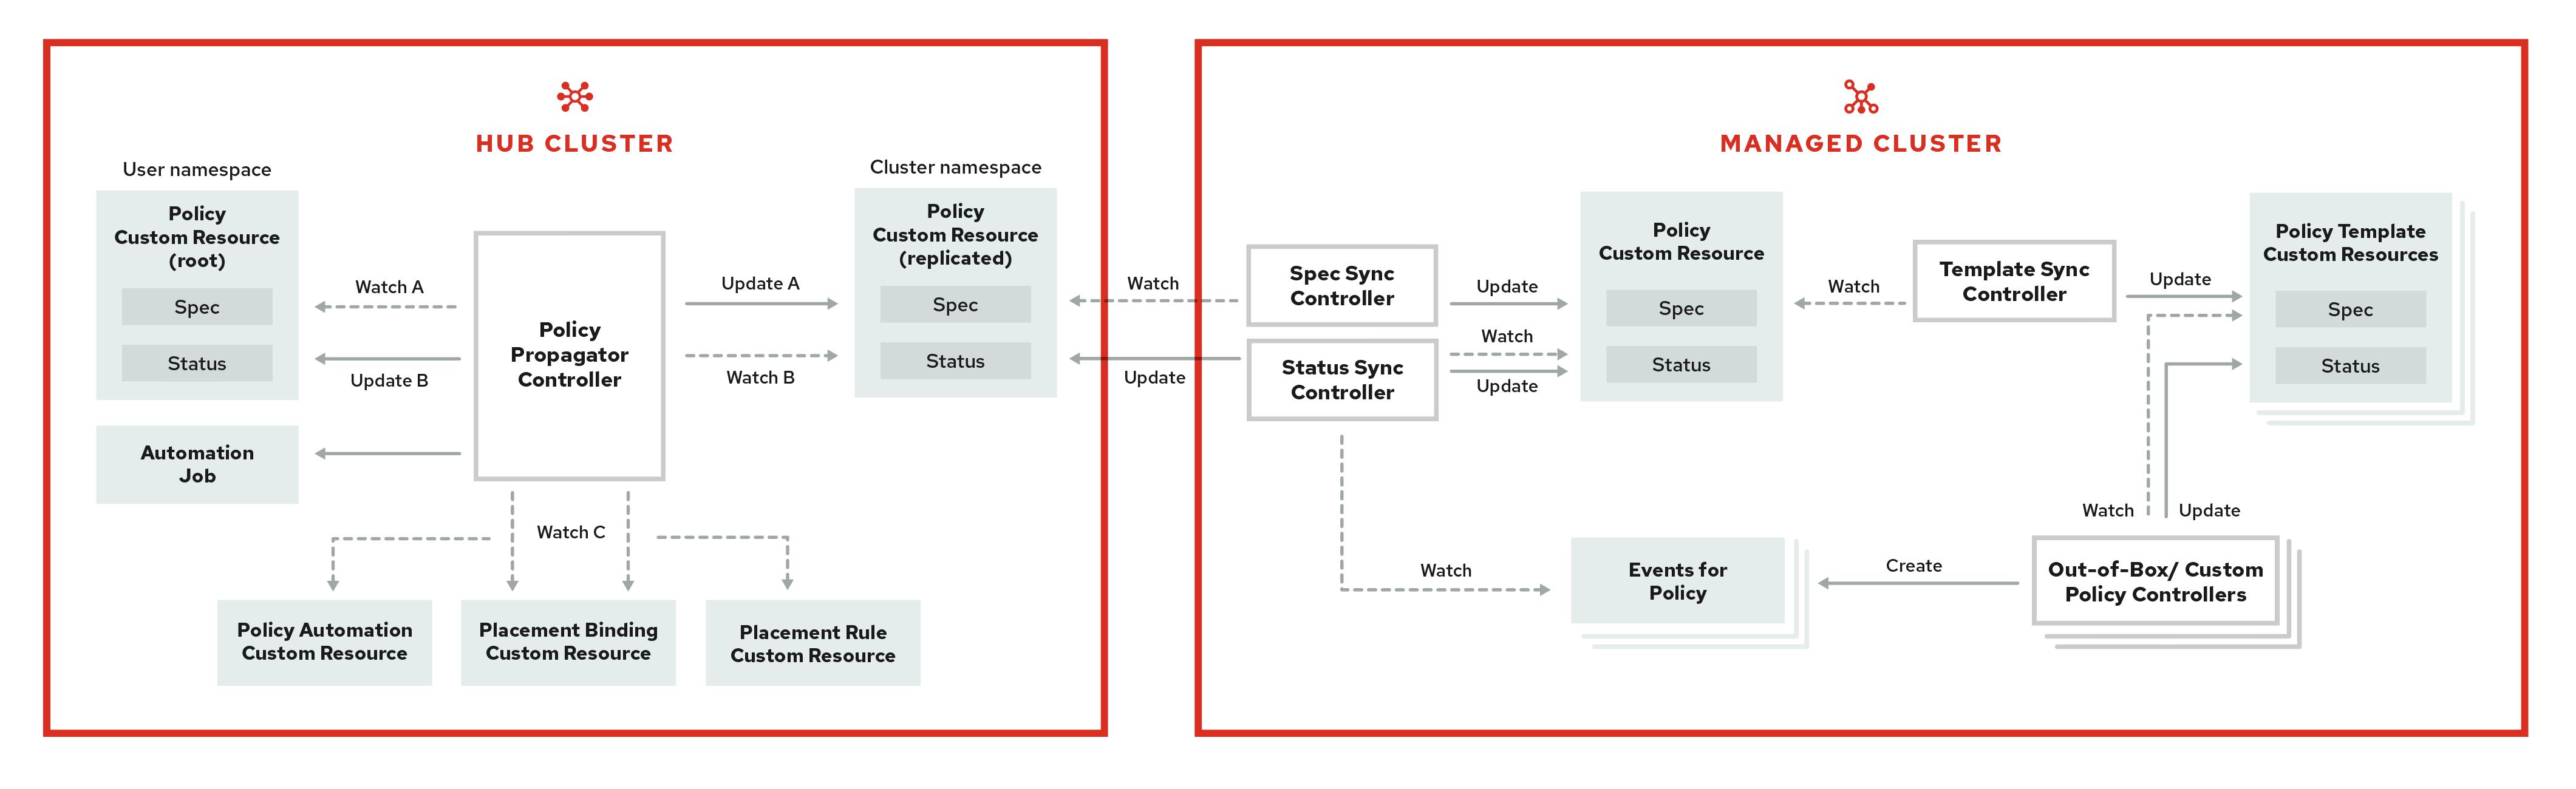 Governance architecture diagram